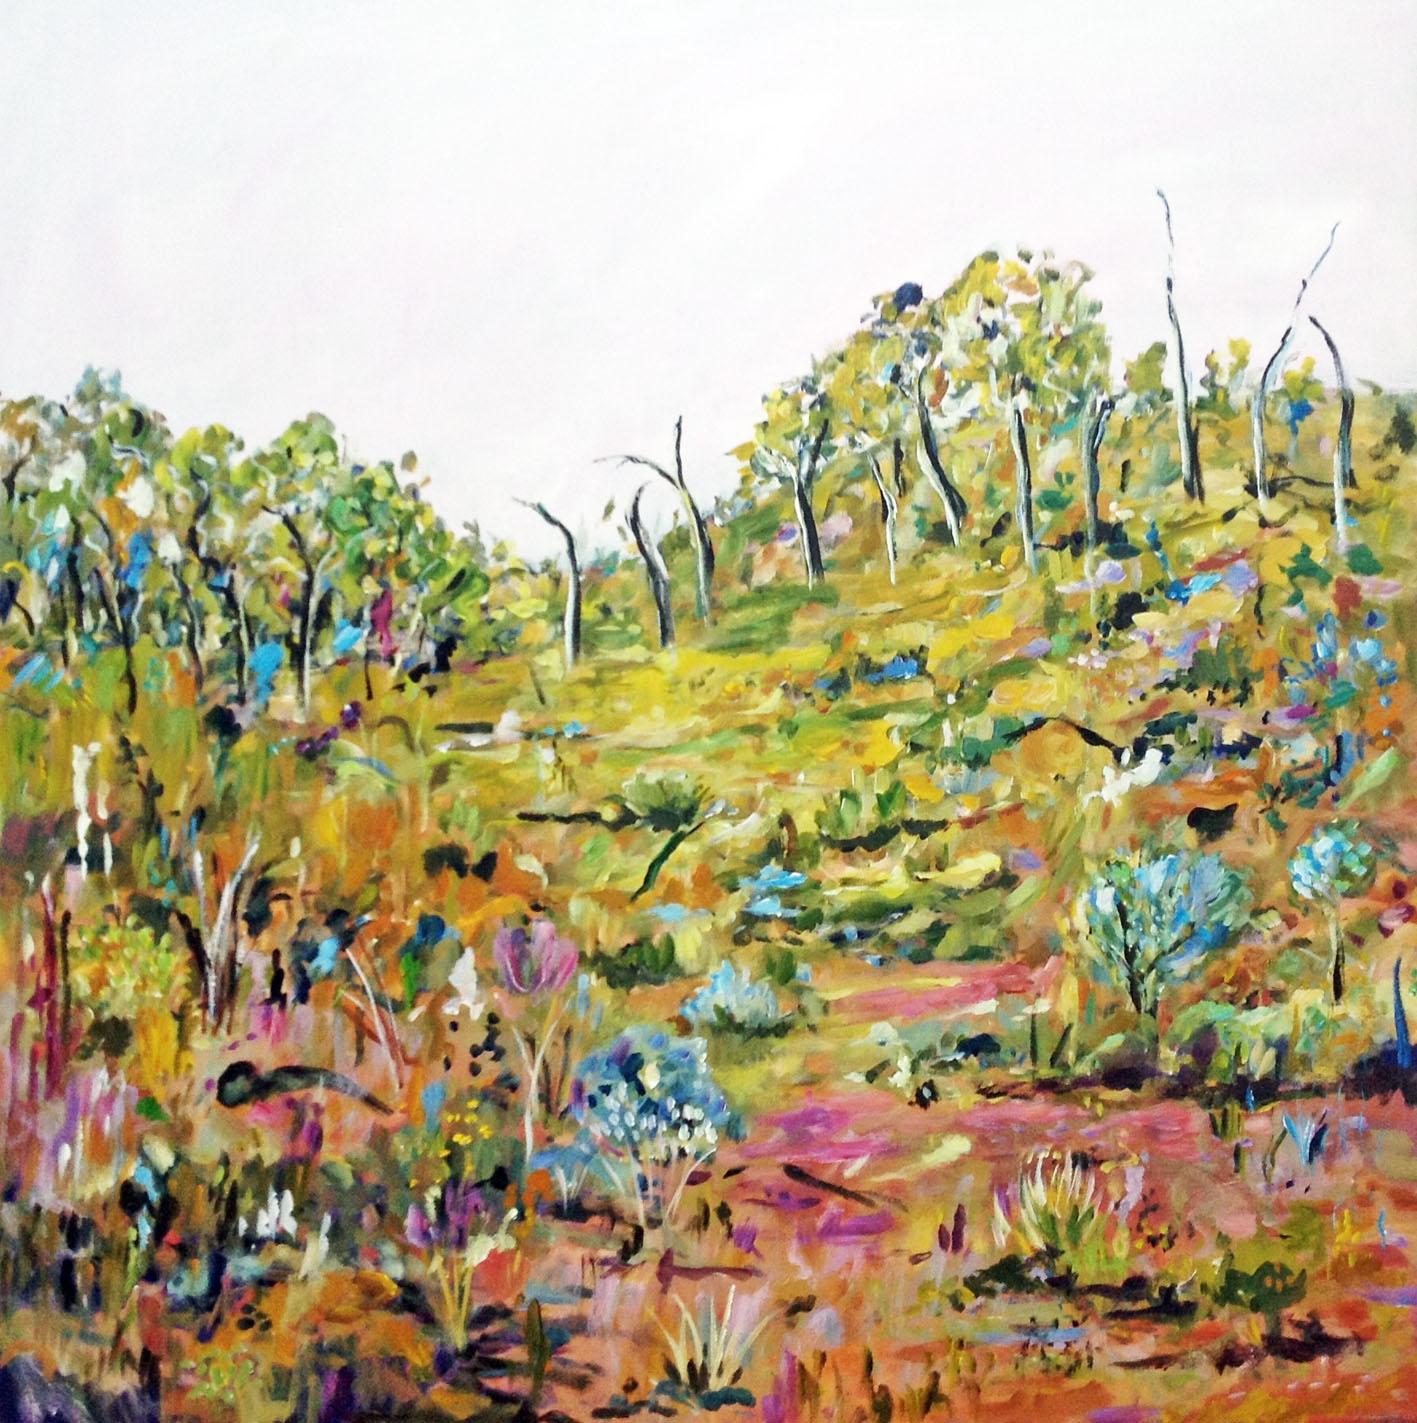 Australian Artist Kathleen Lane - The Corner Store Gallery, Orange NSW